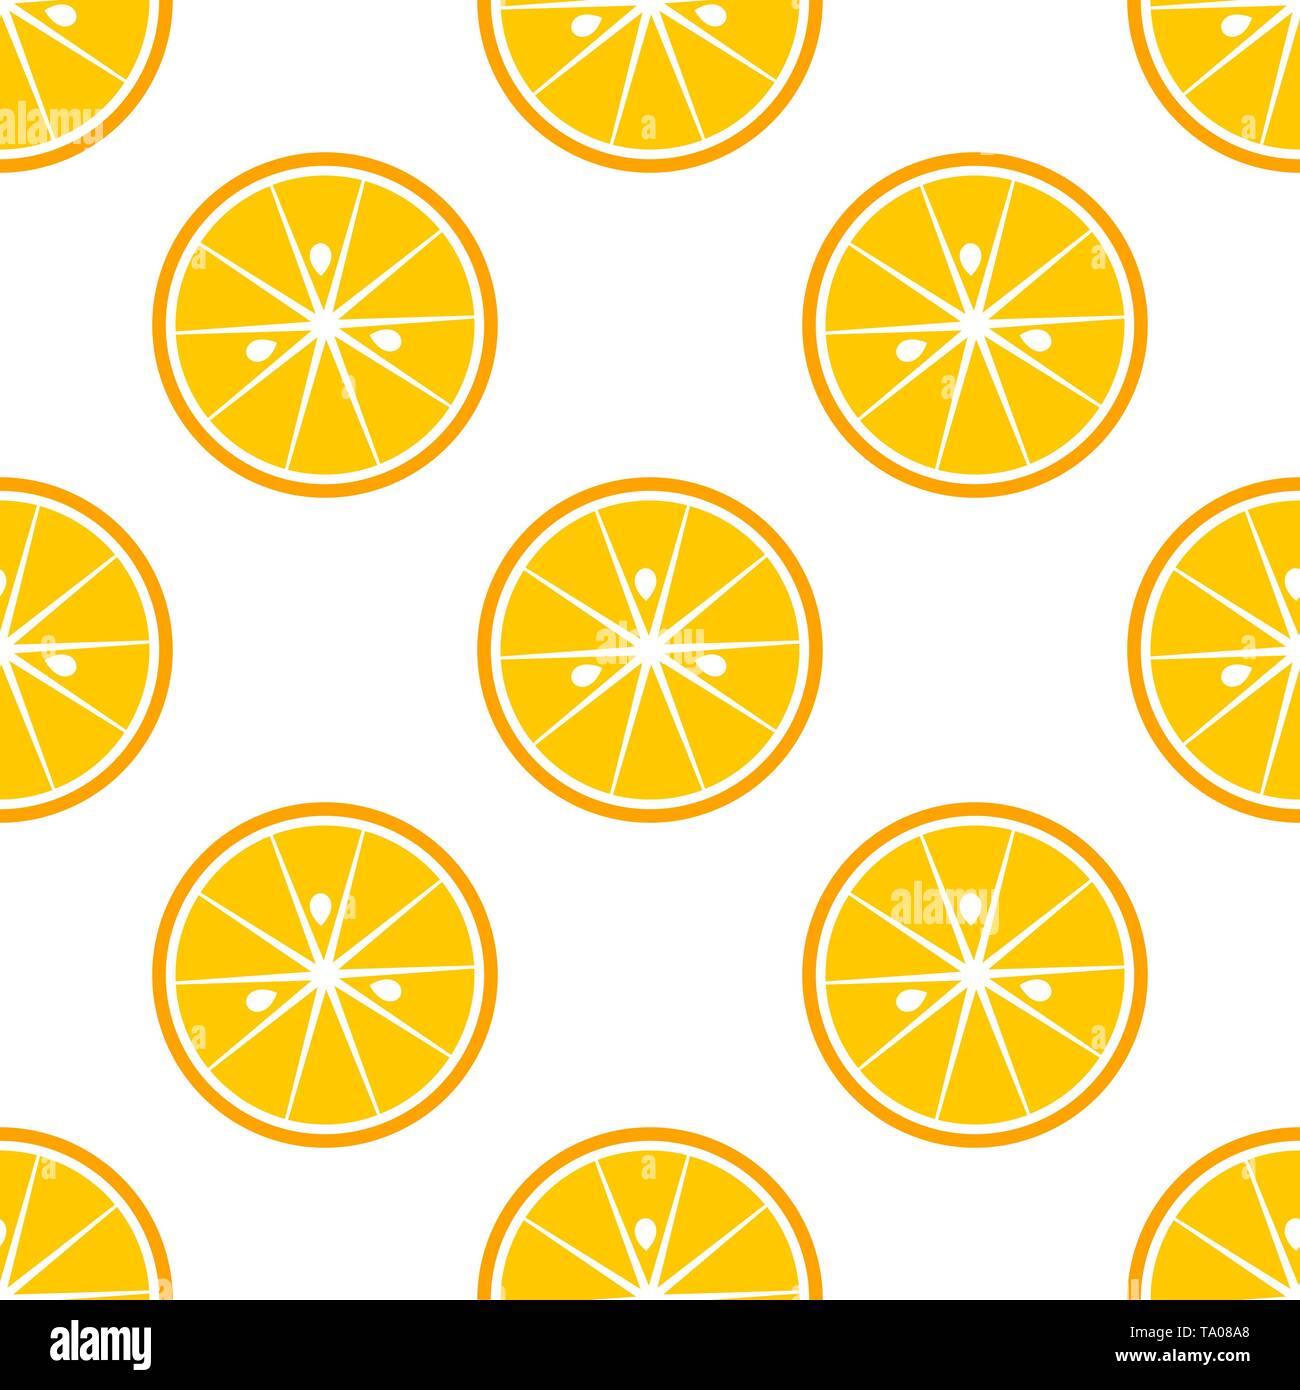 Orange slices citrus pattern. Vector illustration - Stock Image